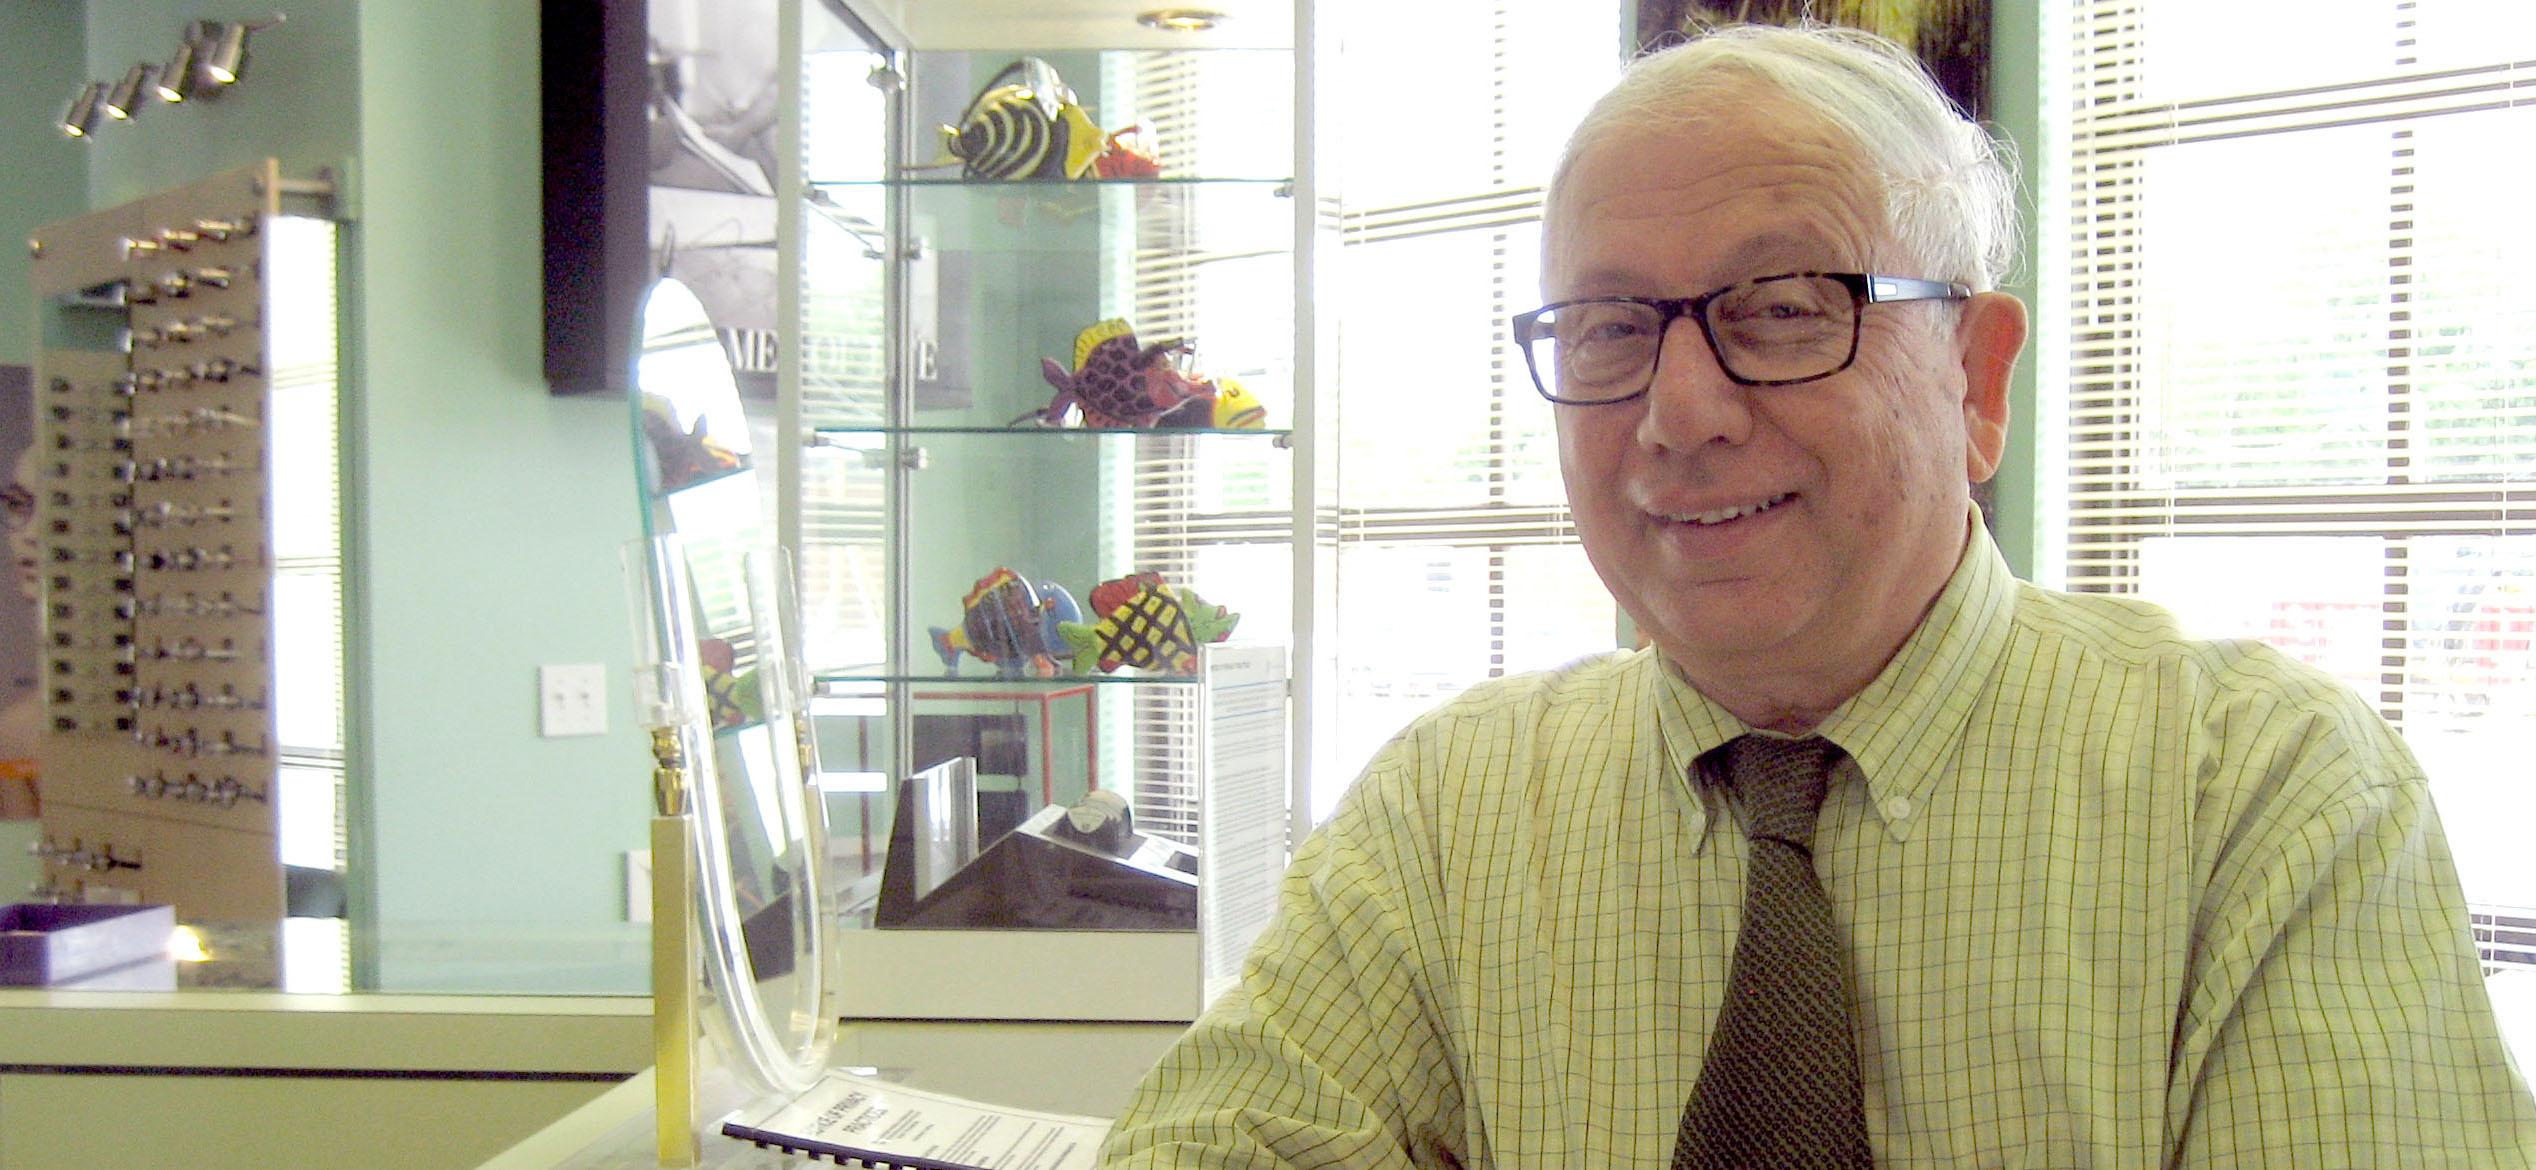 Dr. Irving Edelsberg, Optician at Optical World